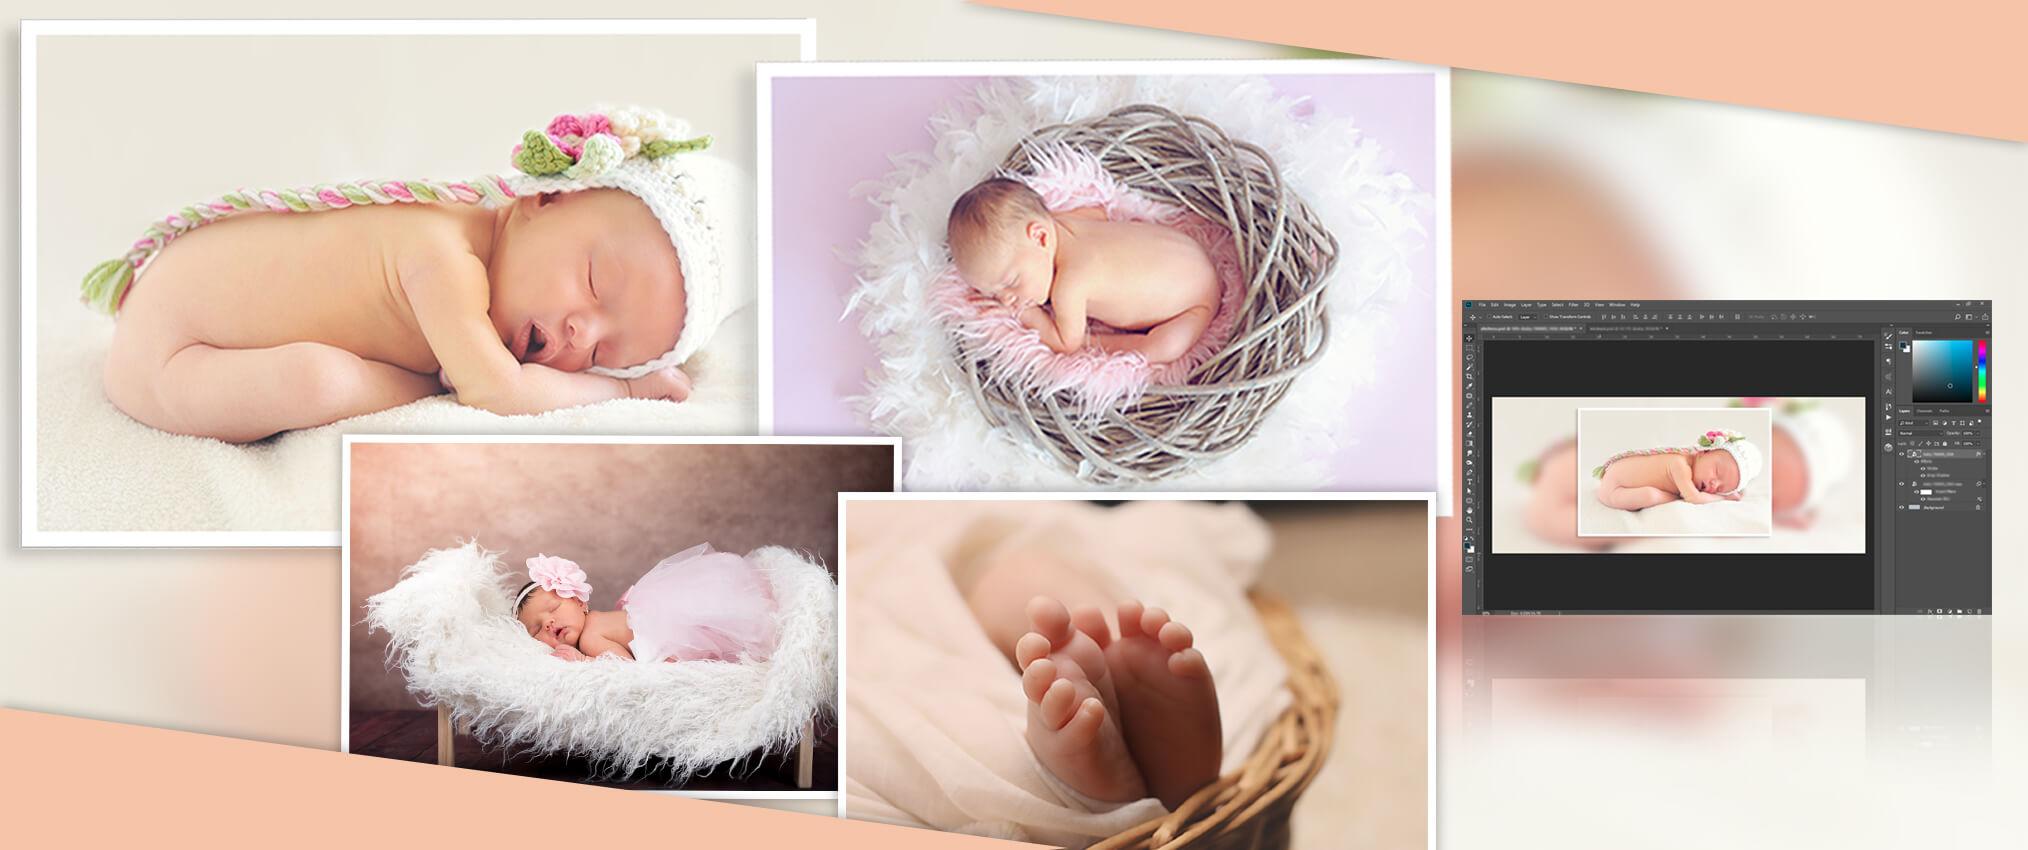 Image editing tips to improve newborn photography editing